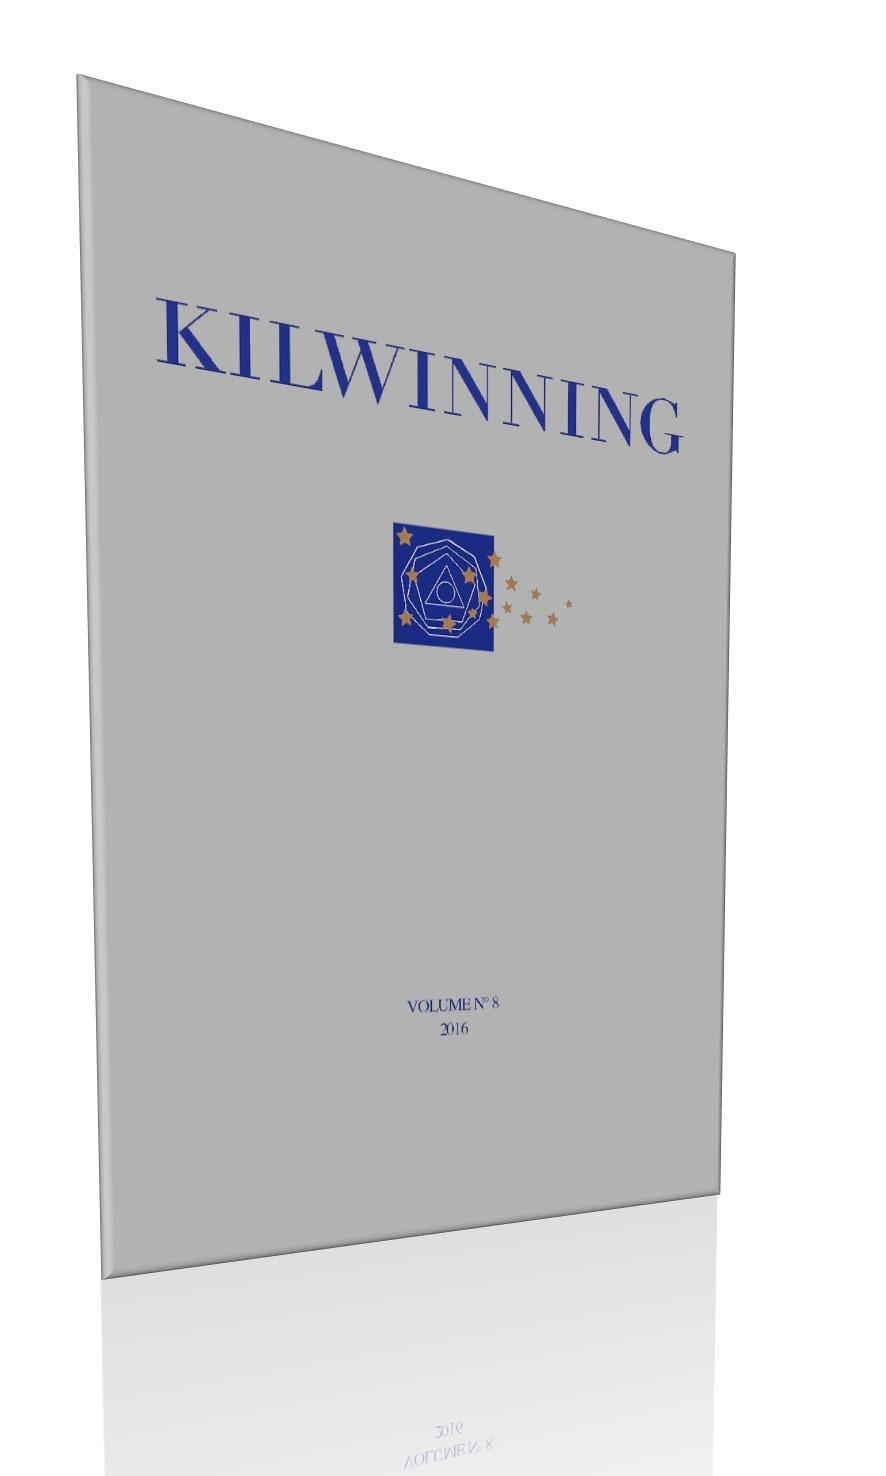 Kilwinning N° 8